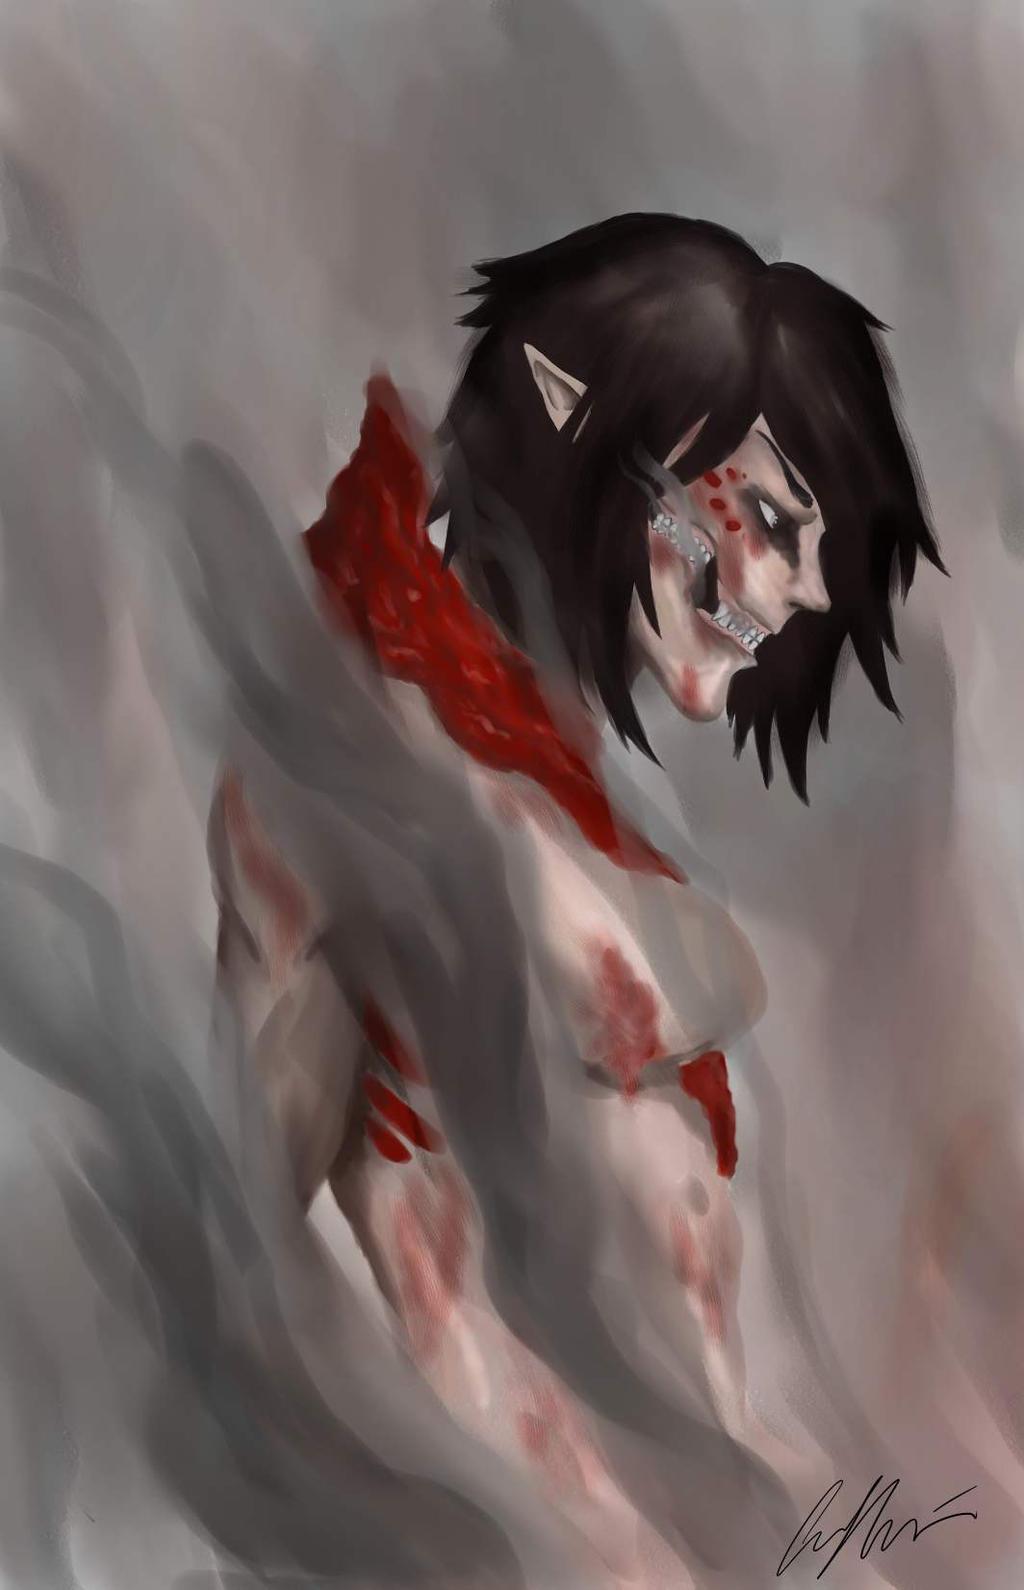 Mikasa collared titan by ceemaire on deviantart mikasa collared titan by ceemaire mikasa collared titan by ceemaire voltagebd Images